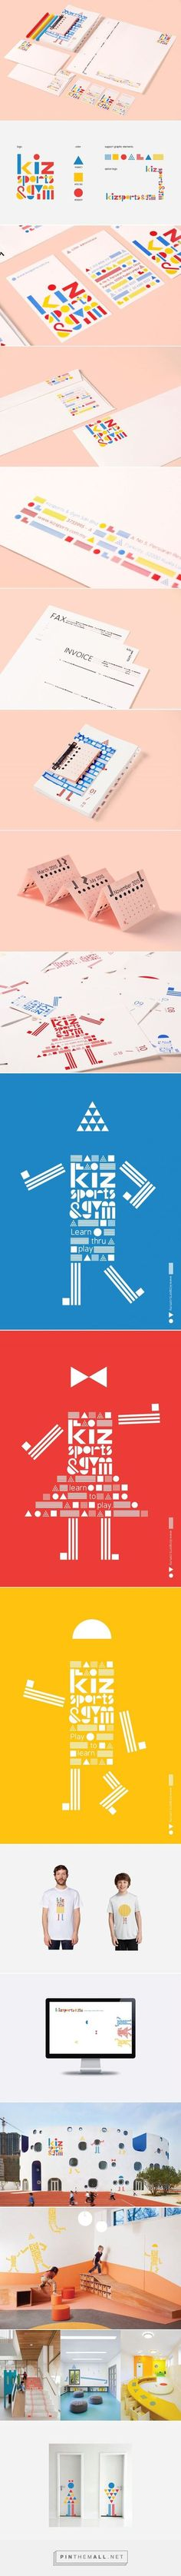 Fivestar Branding Agency – Business Branding and Web Design for Small Business Owners Branding Agency, Kids Branding, Business Branding, Business Card Design, Brand Identity Design, Graphic Design Branding, Corporate Design, Graphic Design Illustration, Web Design